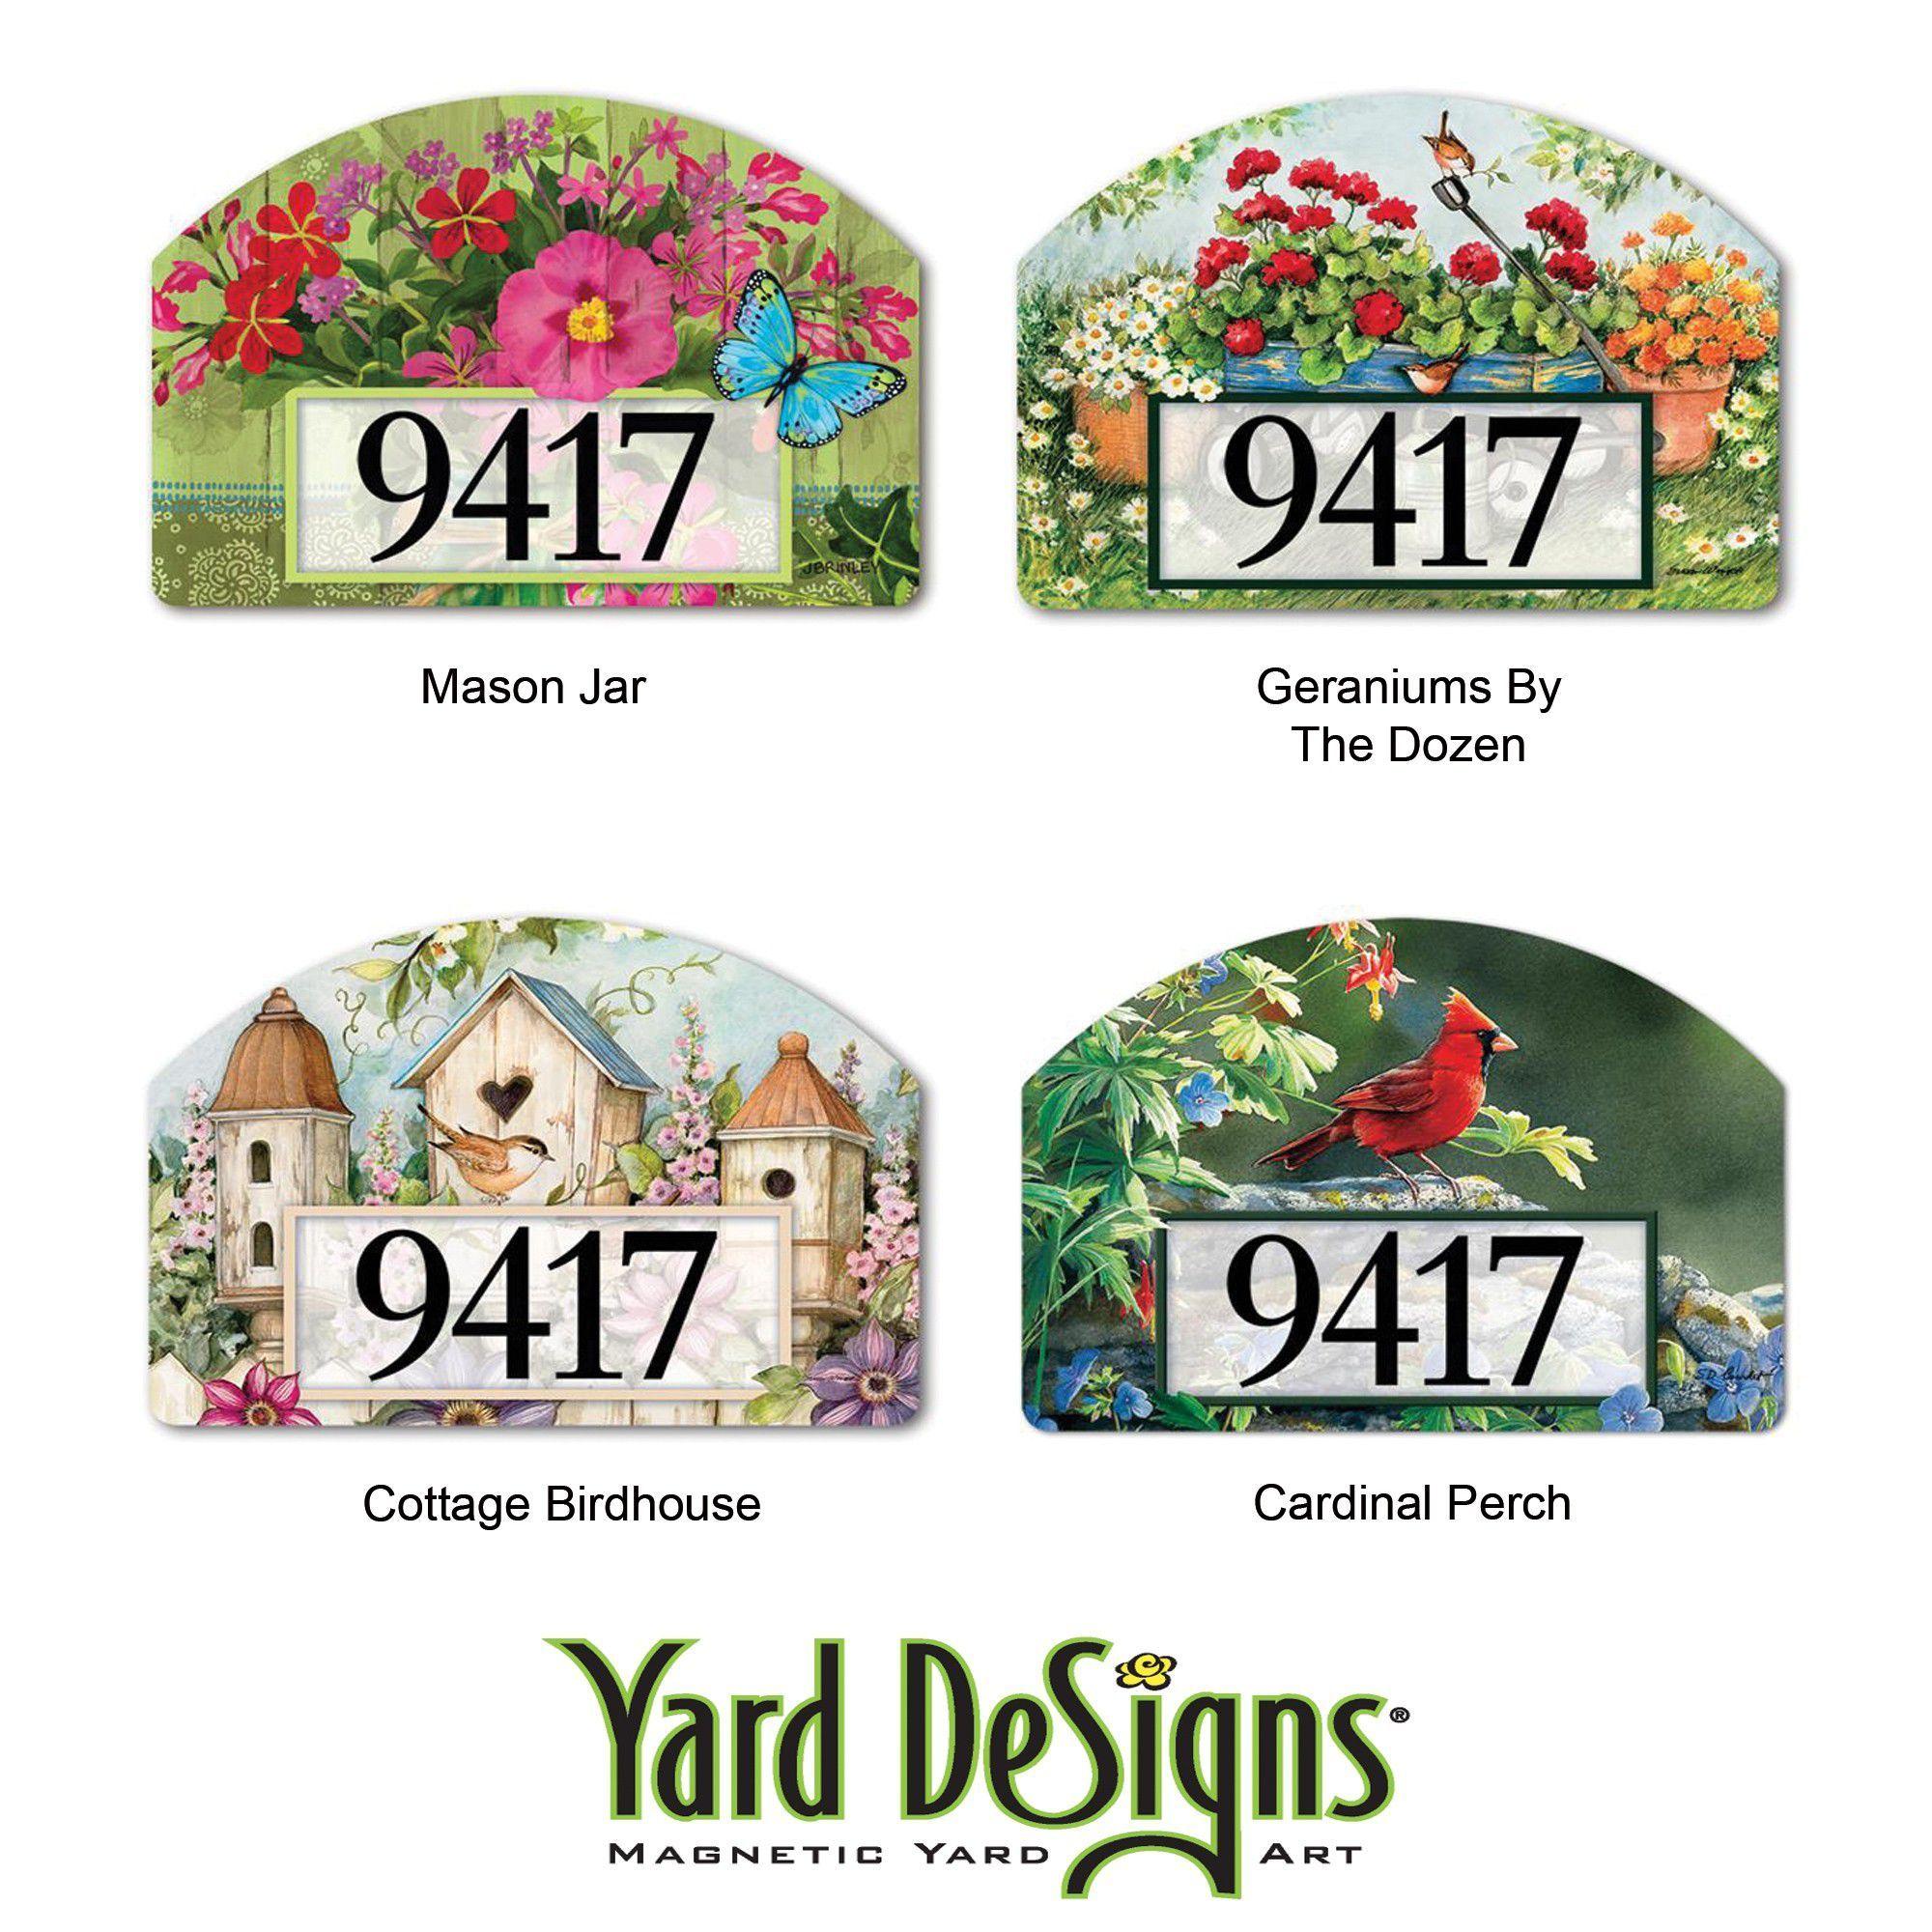 Pin By Dora Morgan On Yard Design Idea Pinterest Yard Design